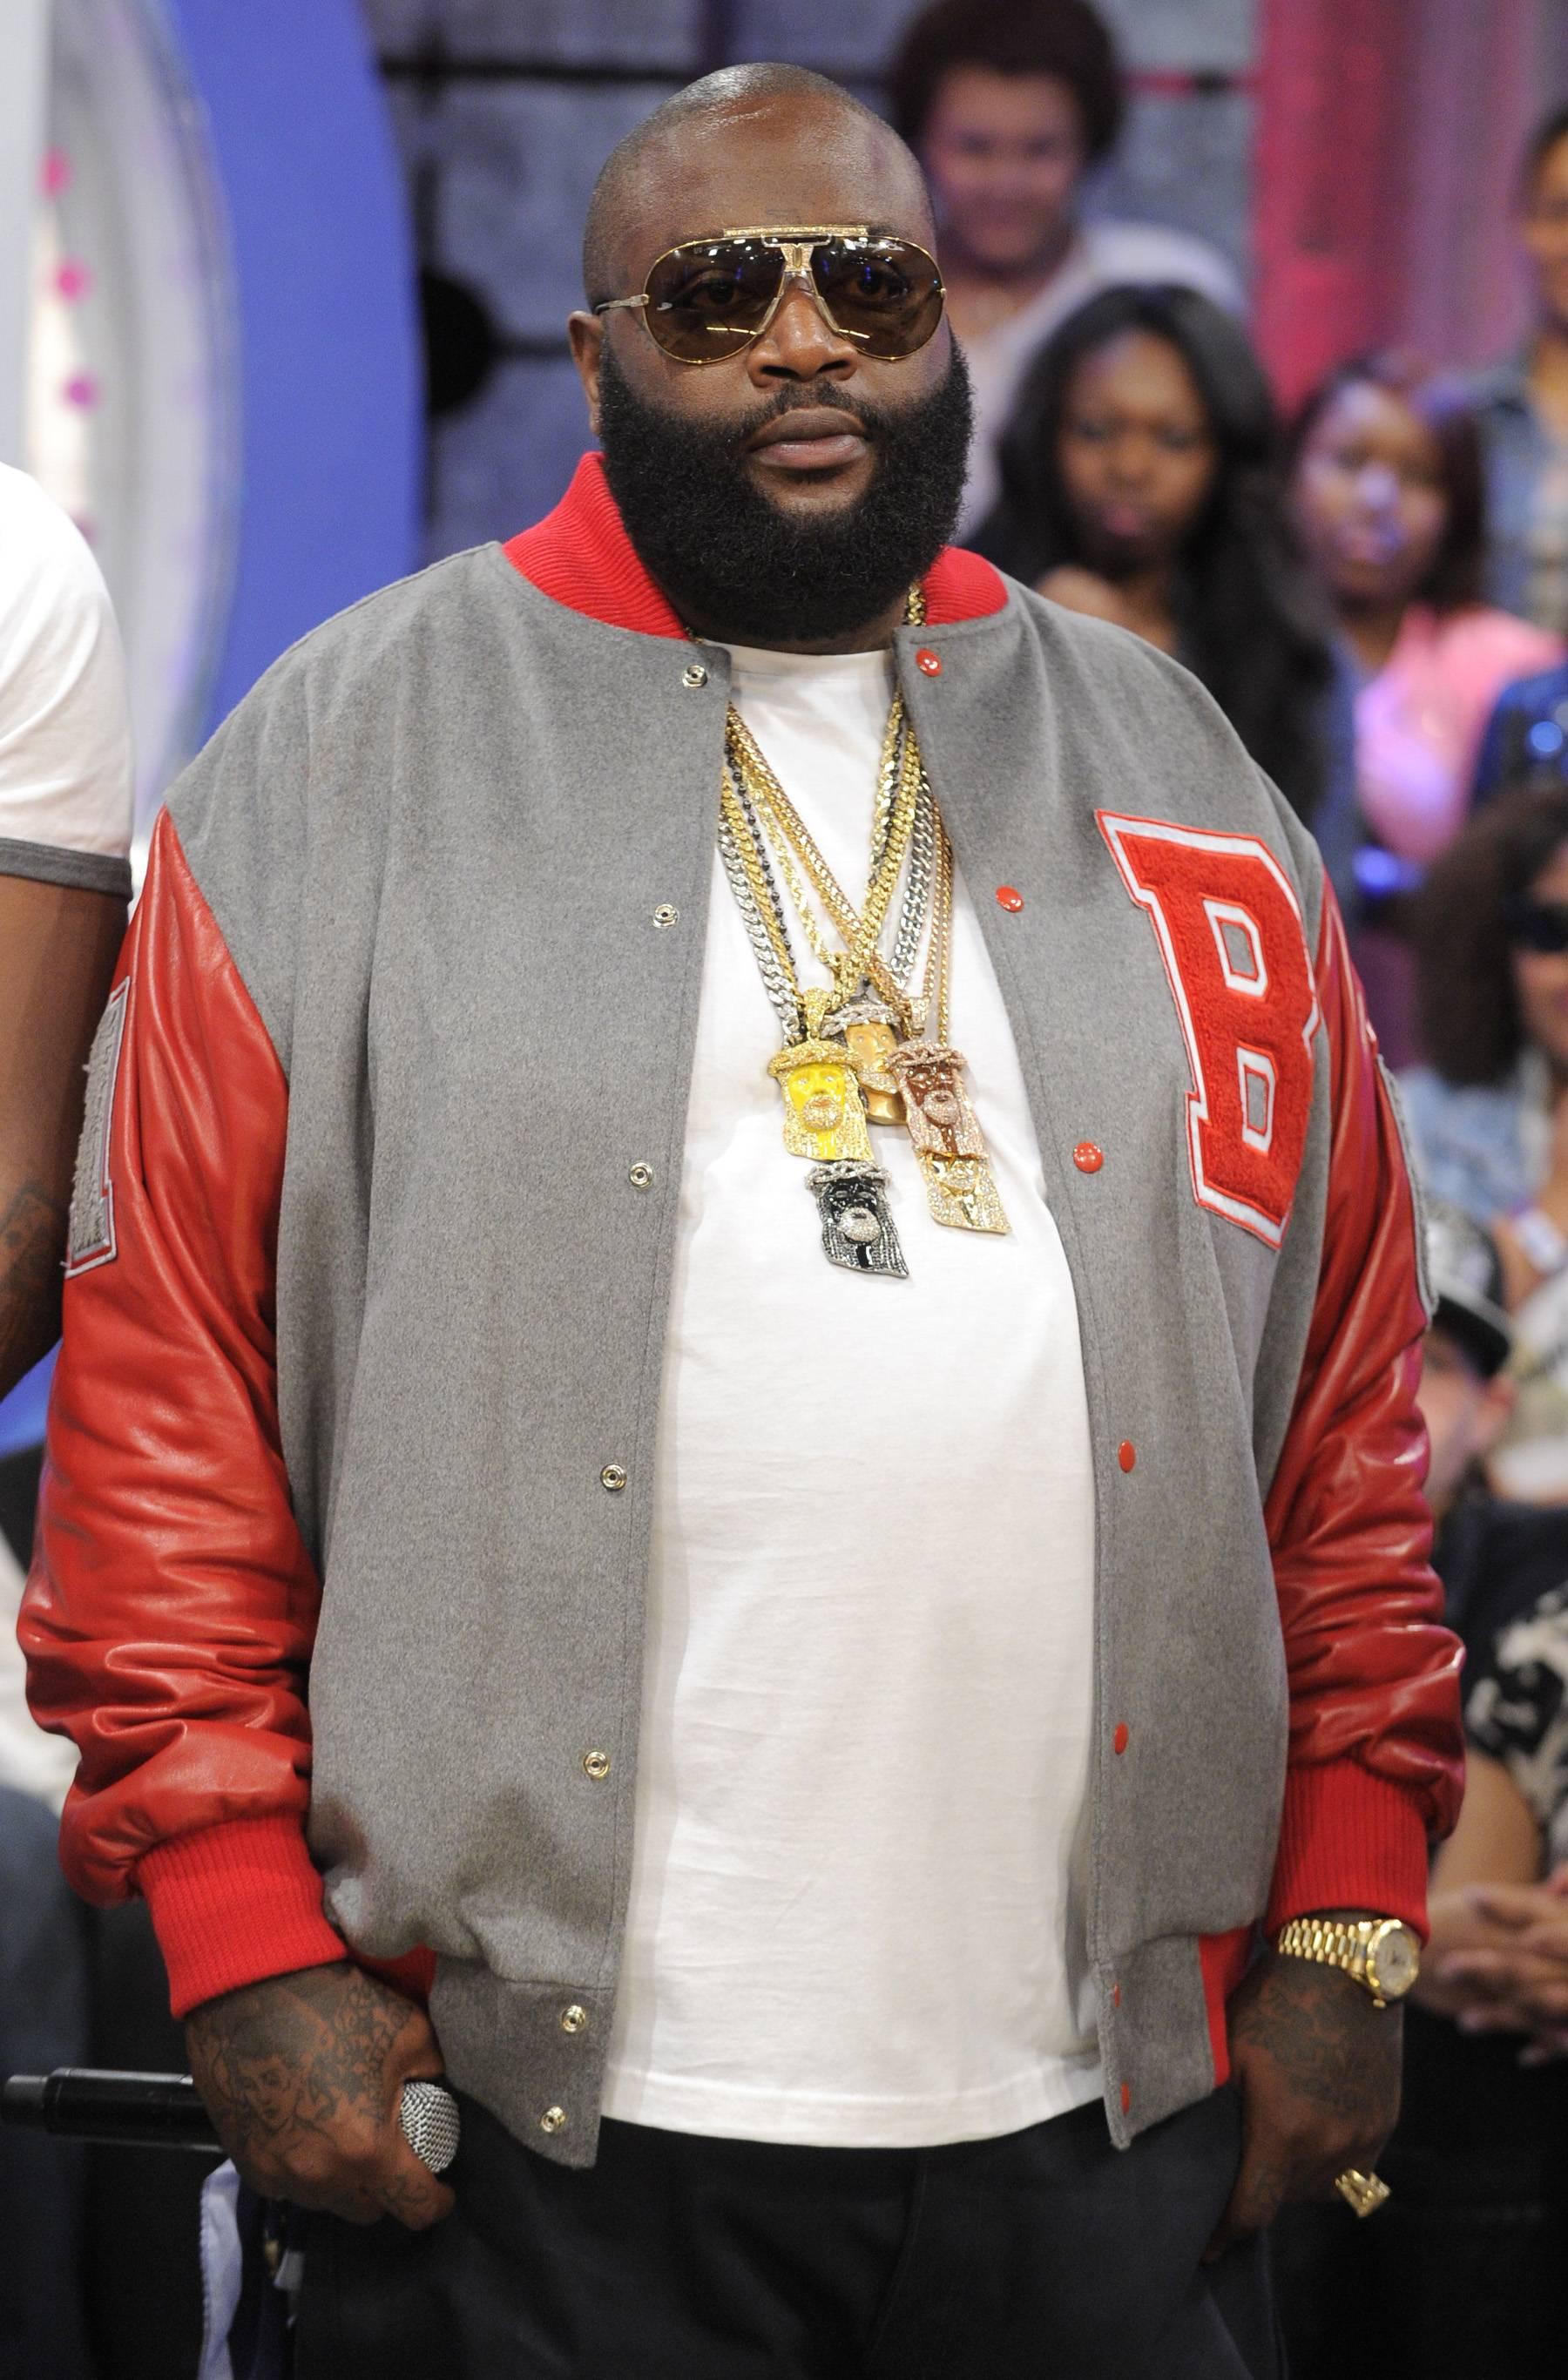 The Boss - Rick Ross at 106 & Park, May 2, 2012. (Photo: John Ricard/BET)